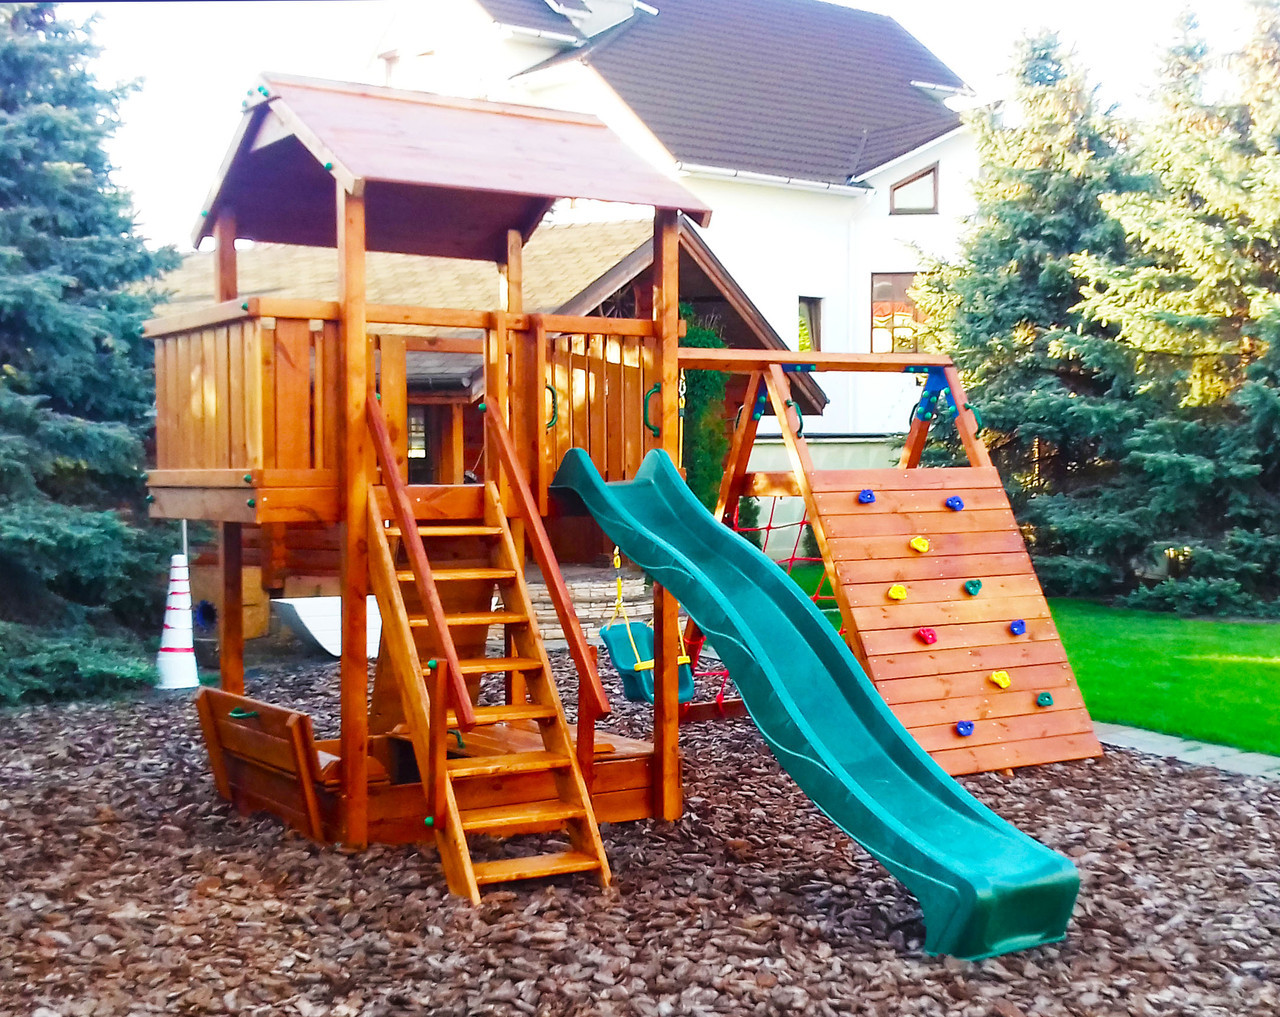 Дитячий майданчик Spielplatz Бруно з лазом, гойдалкою, лазом Есто та пісочницею-трансформер